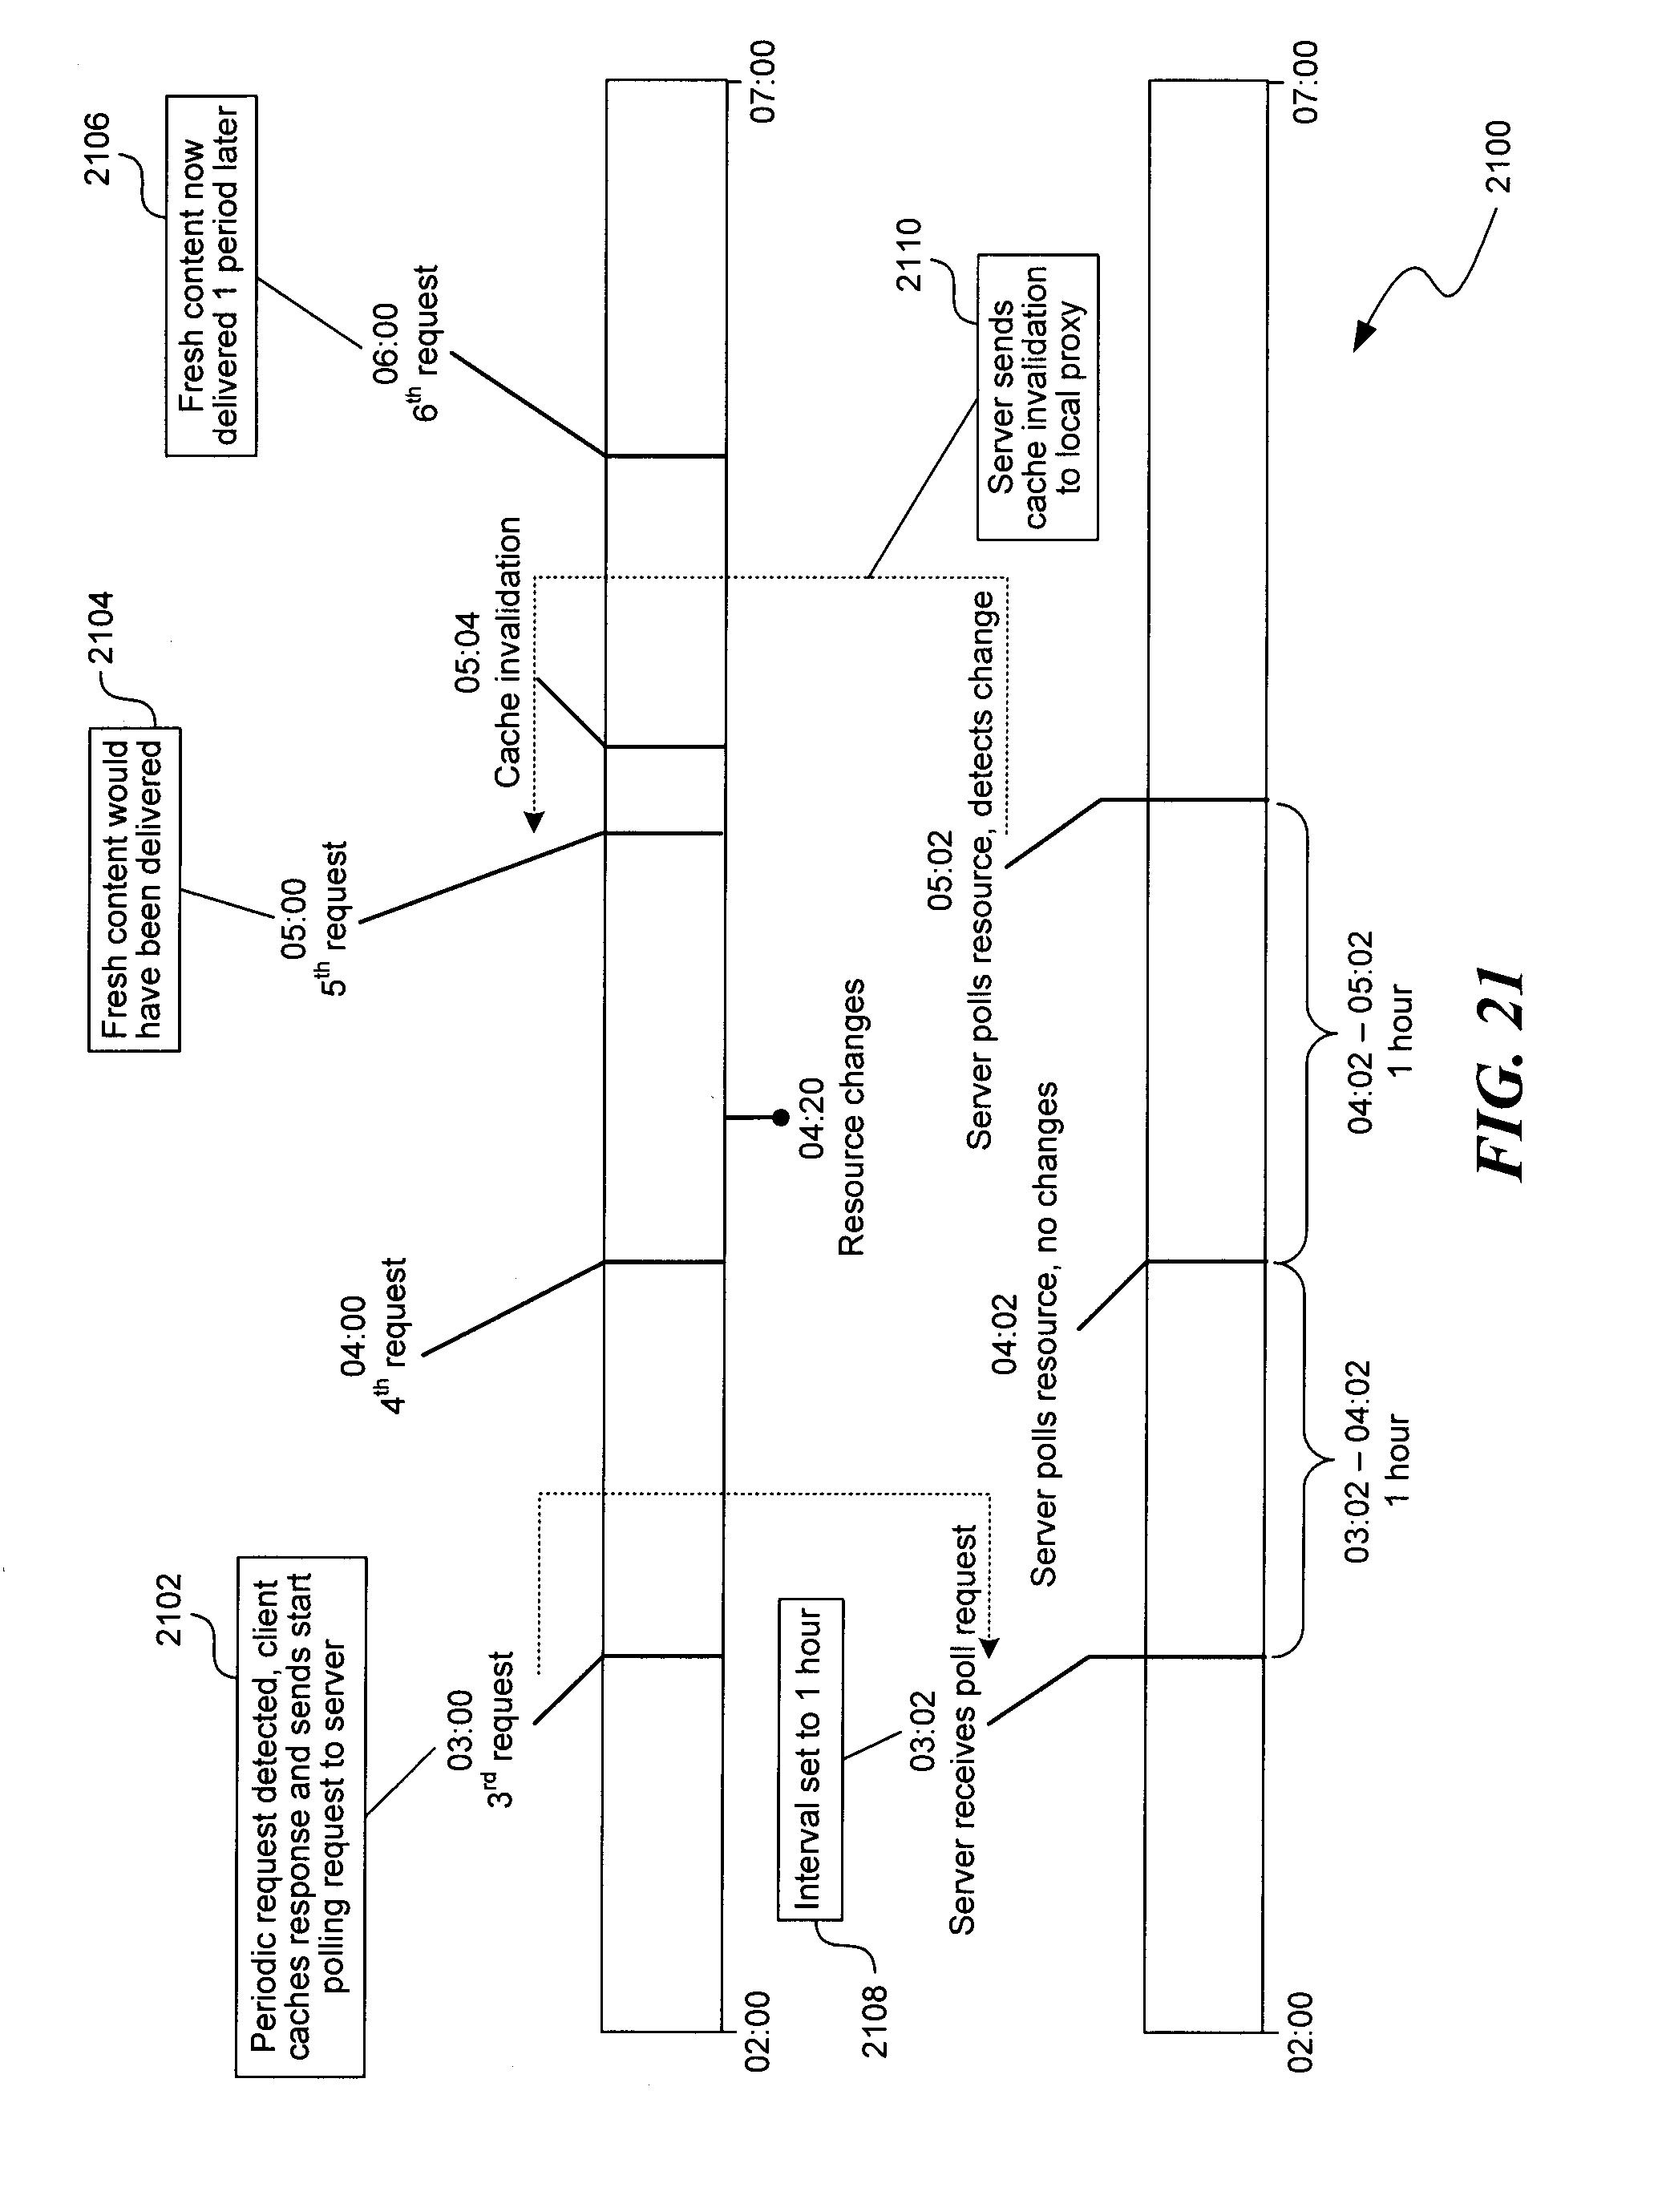 Patent US 8,326,985 B2